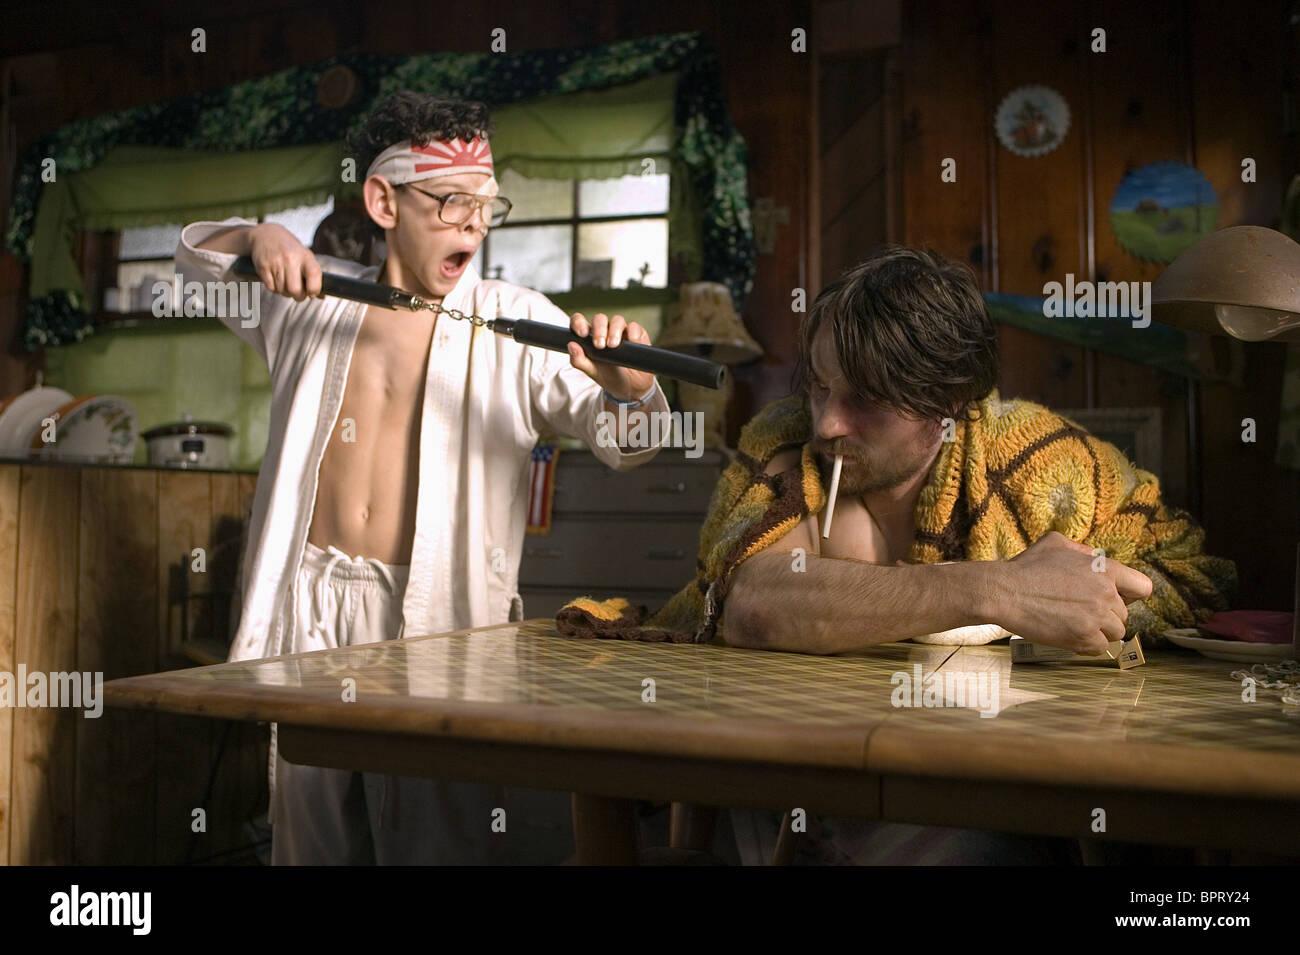 ZACH CUMER & MARTIN HENDERSON SMOKIN' ACES; SMOKING ACES (2006) - Stock Image